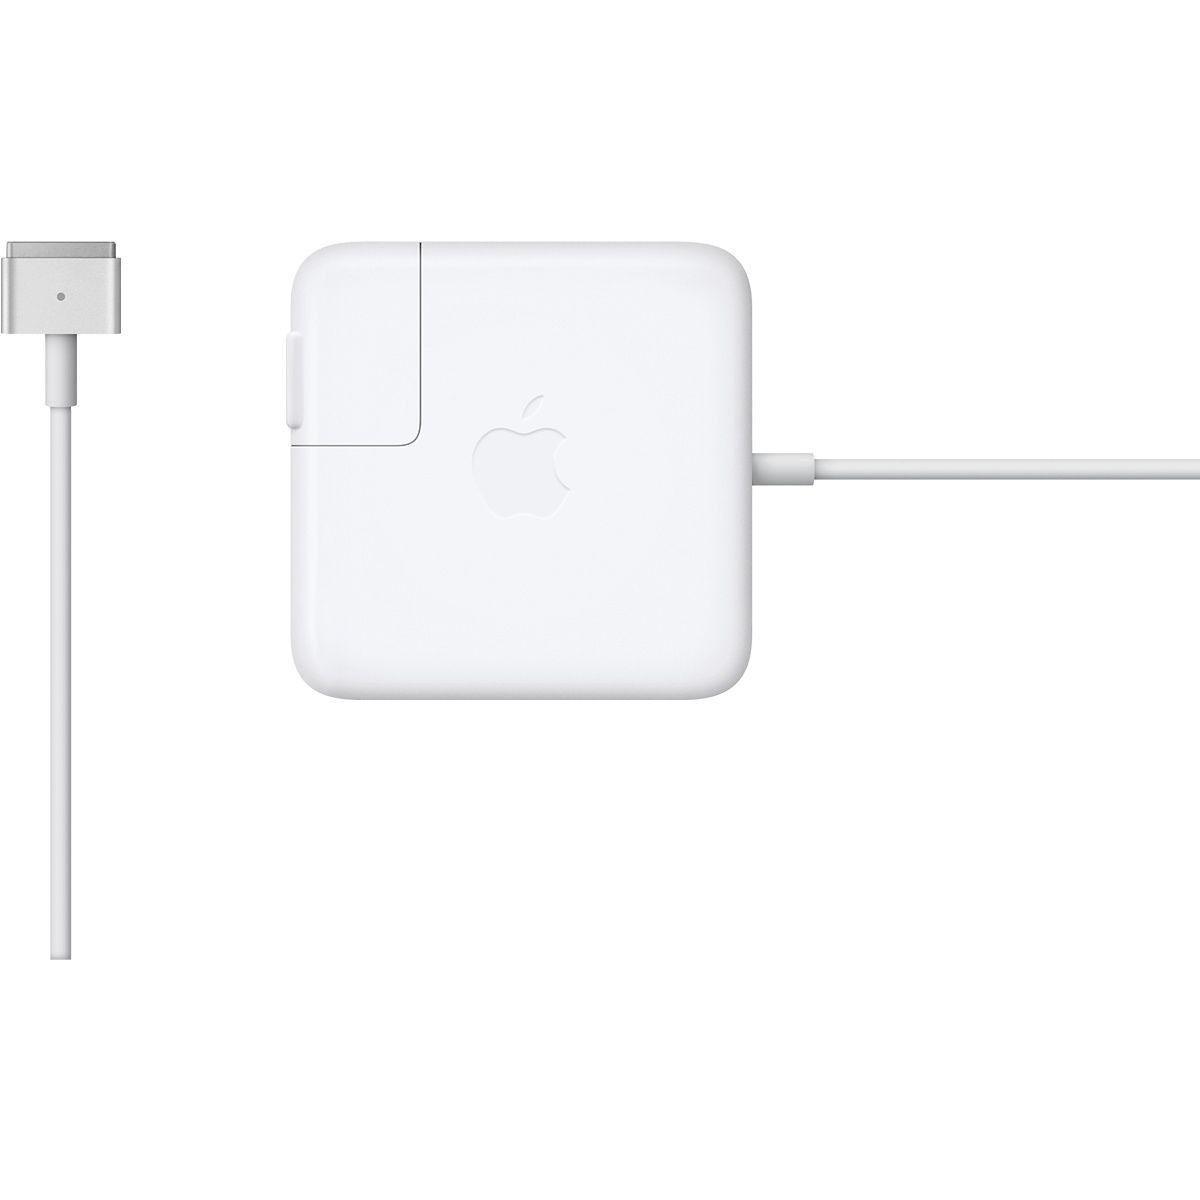 New Original Oem 45w Charger 2012 2013 2014 2015 2016 2017 11 13 Macbook Air Magsafe Apple Macbook Apple Laptop